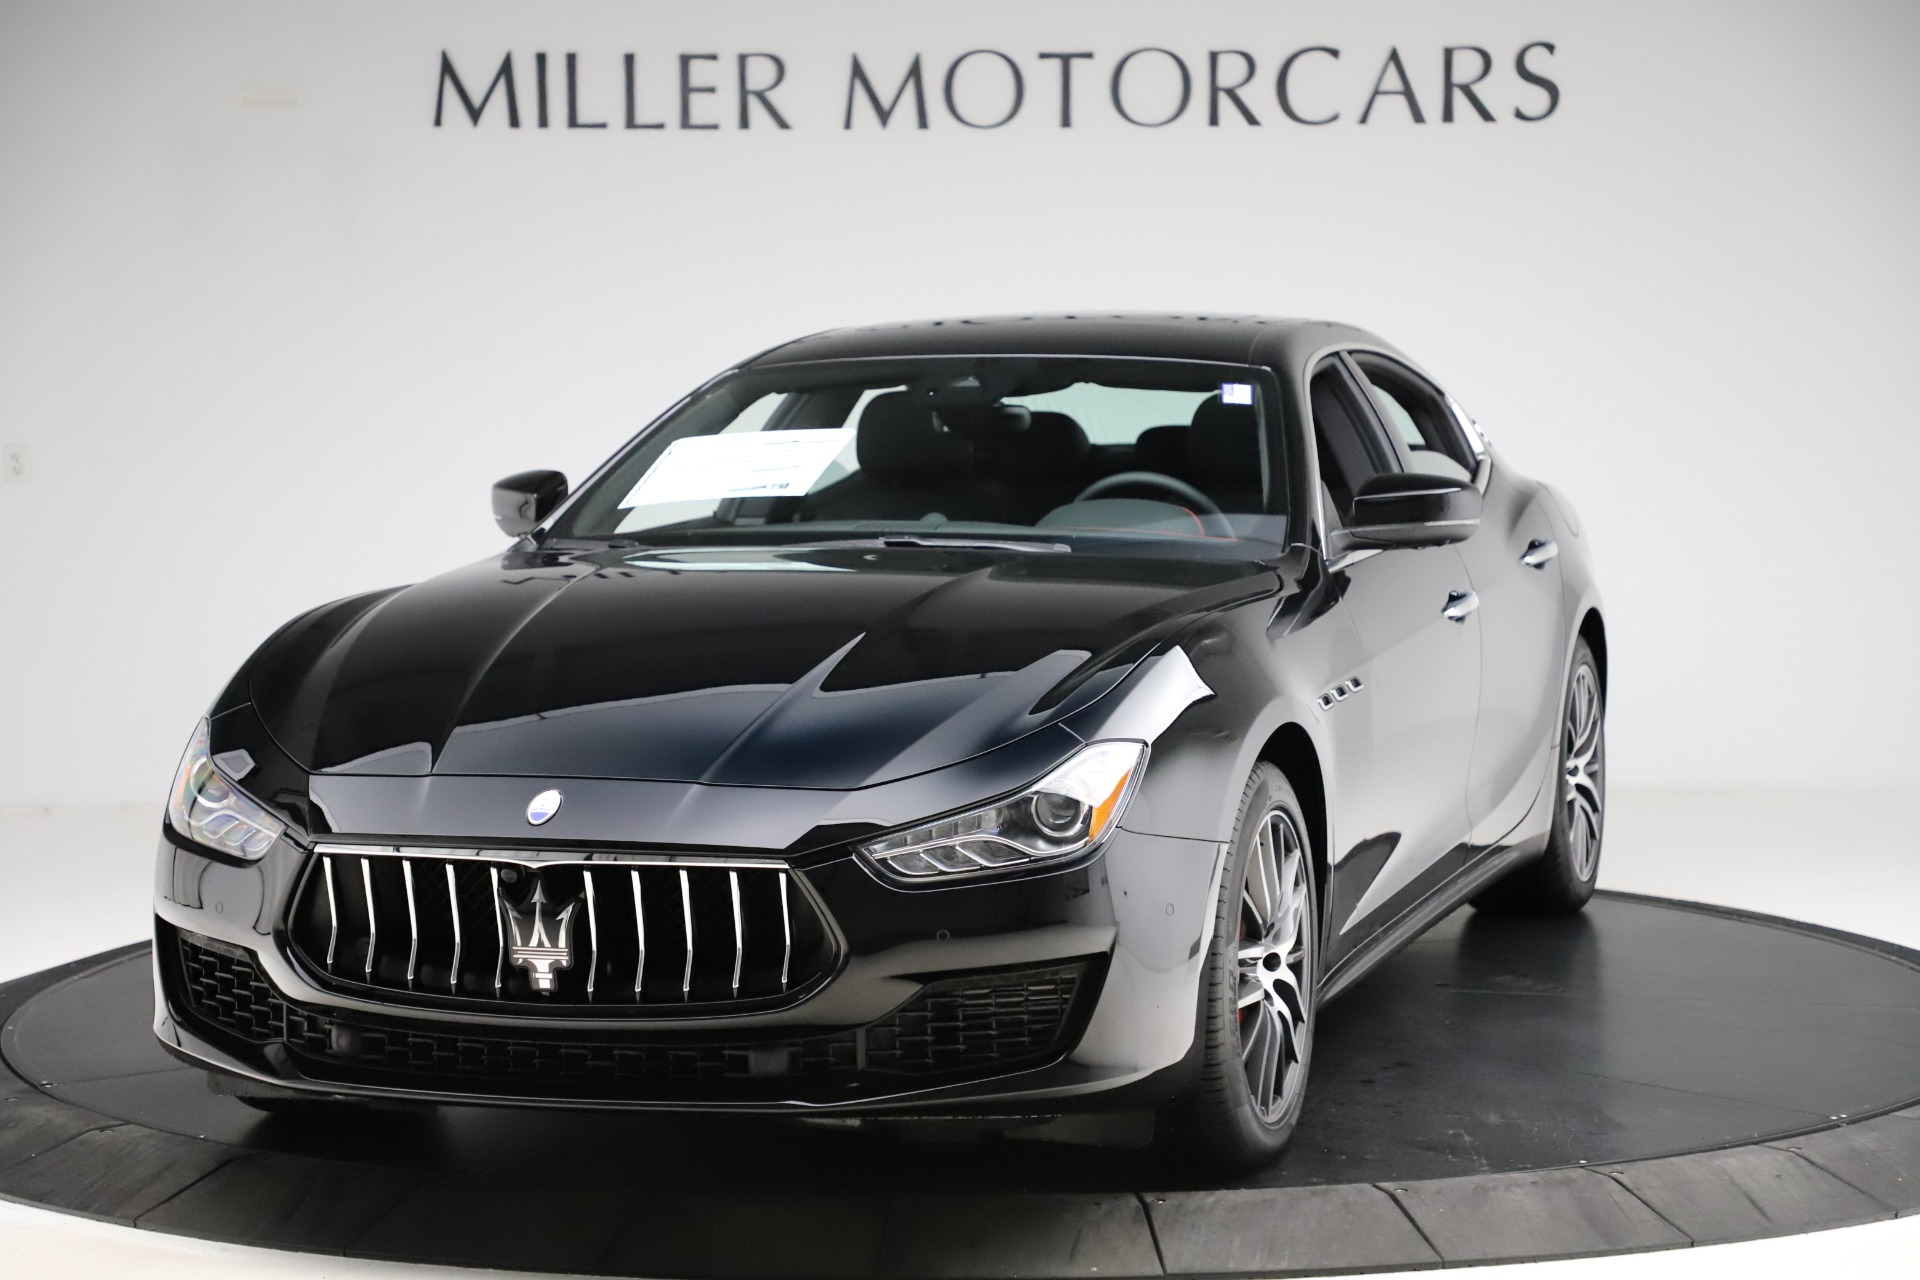 New 2020 Maserati Ghibli S Q4 for sale $84,104 at Pagani of Greenwich in Greenwich CT 06830 1